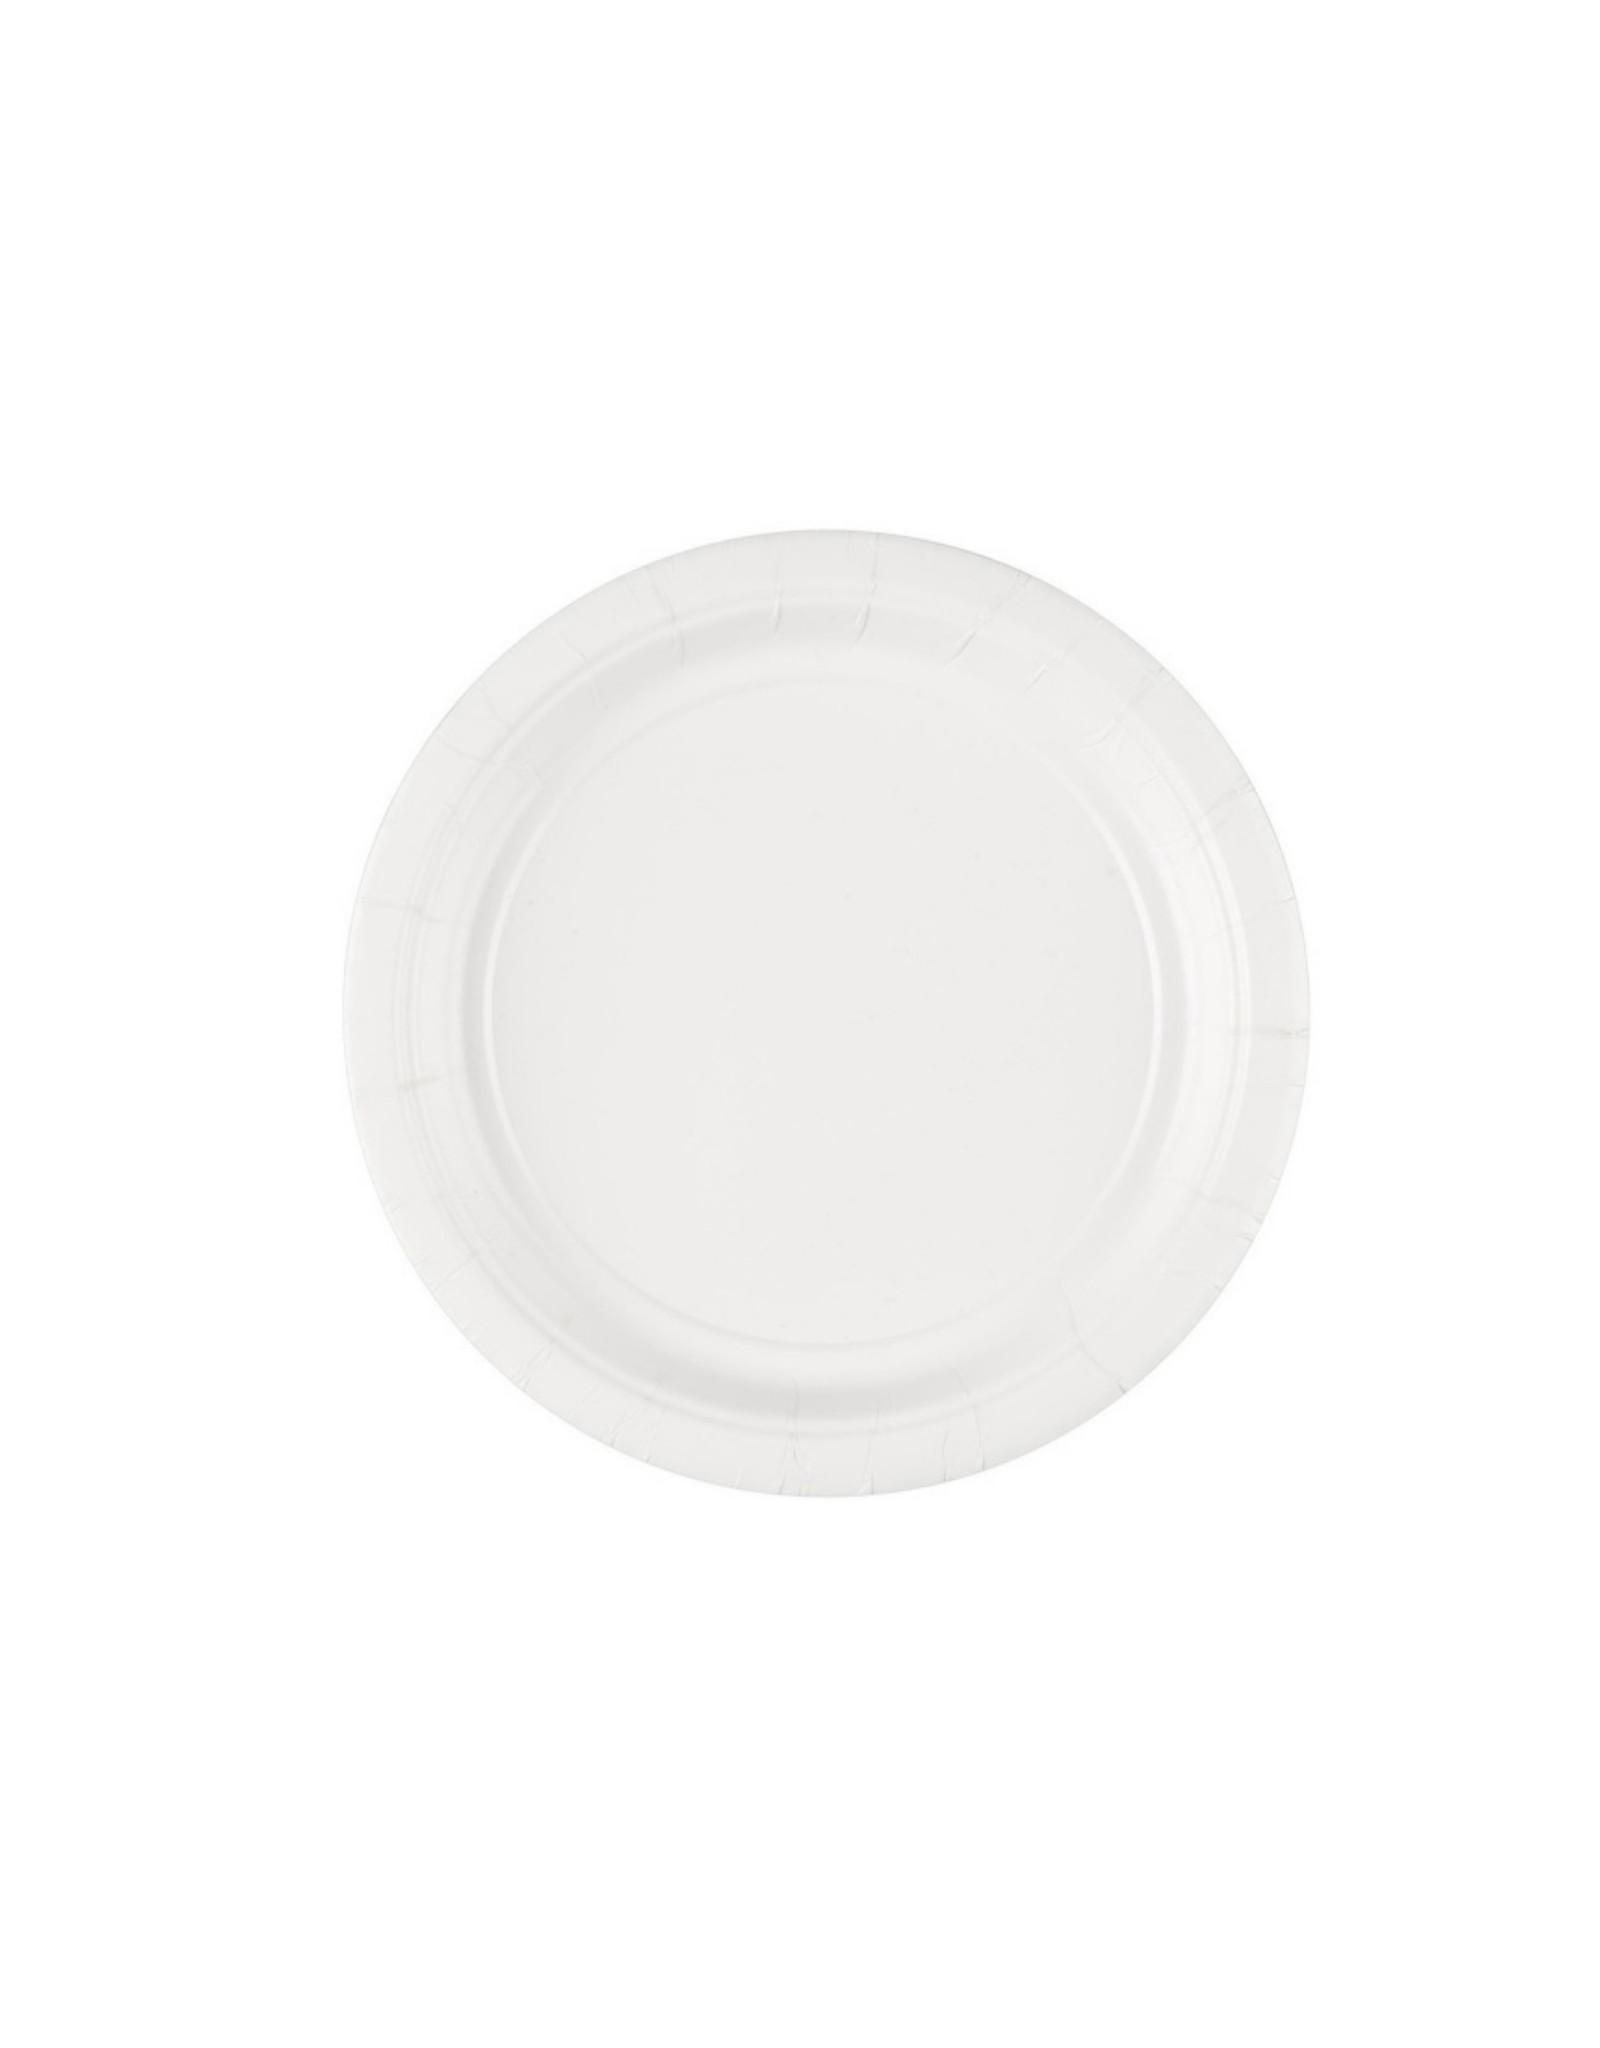 Feestbord wit 8 stuks